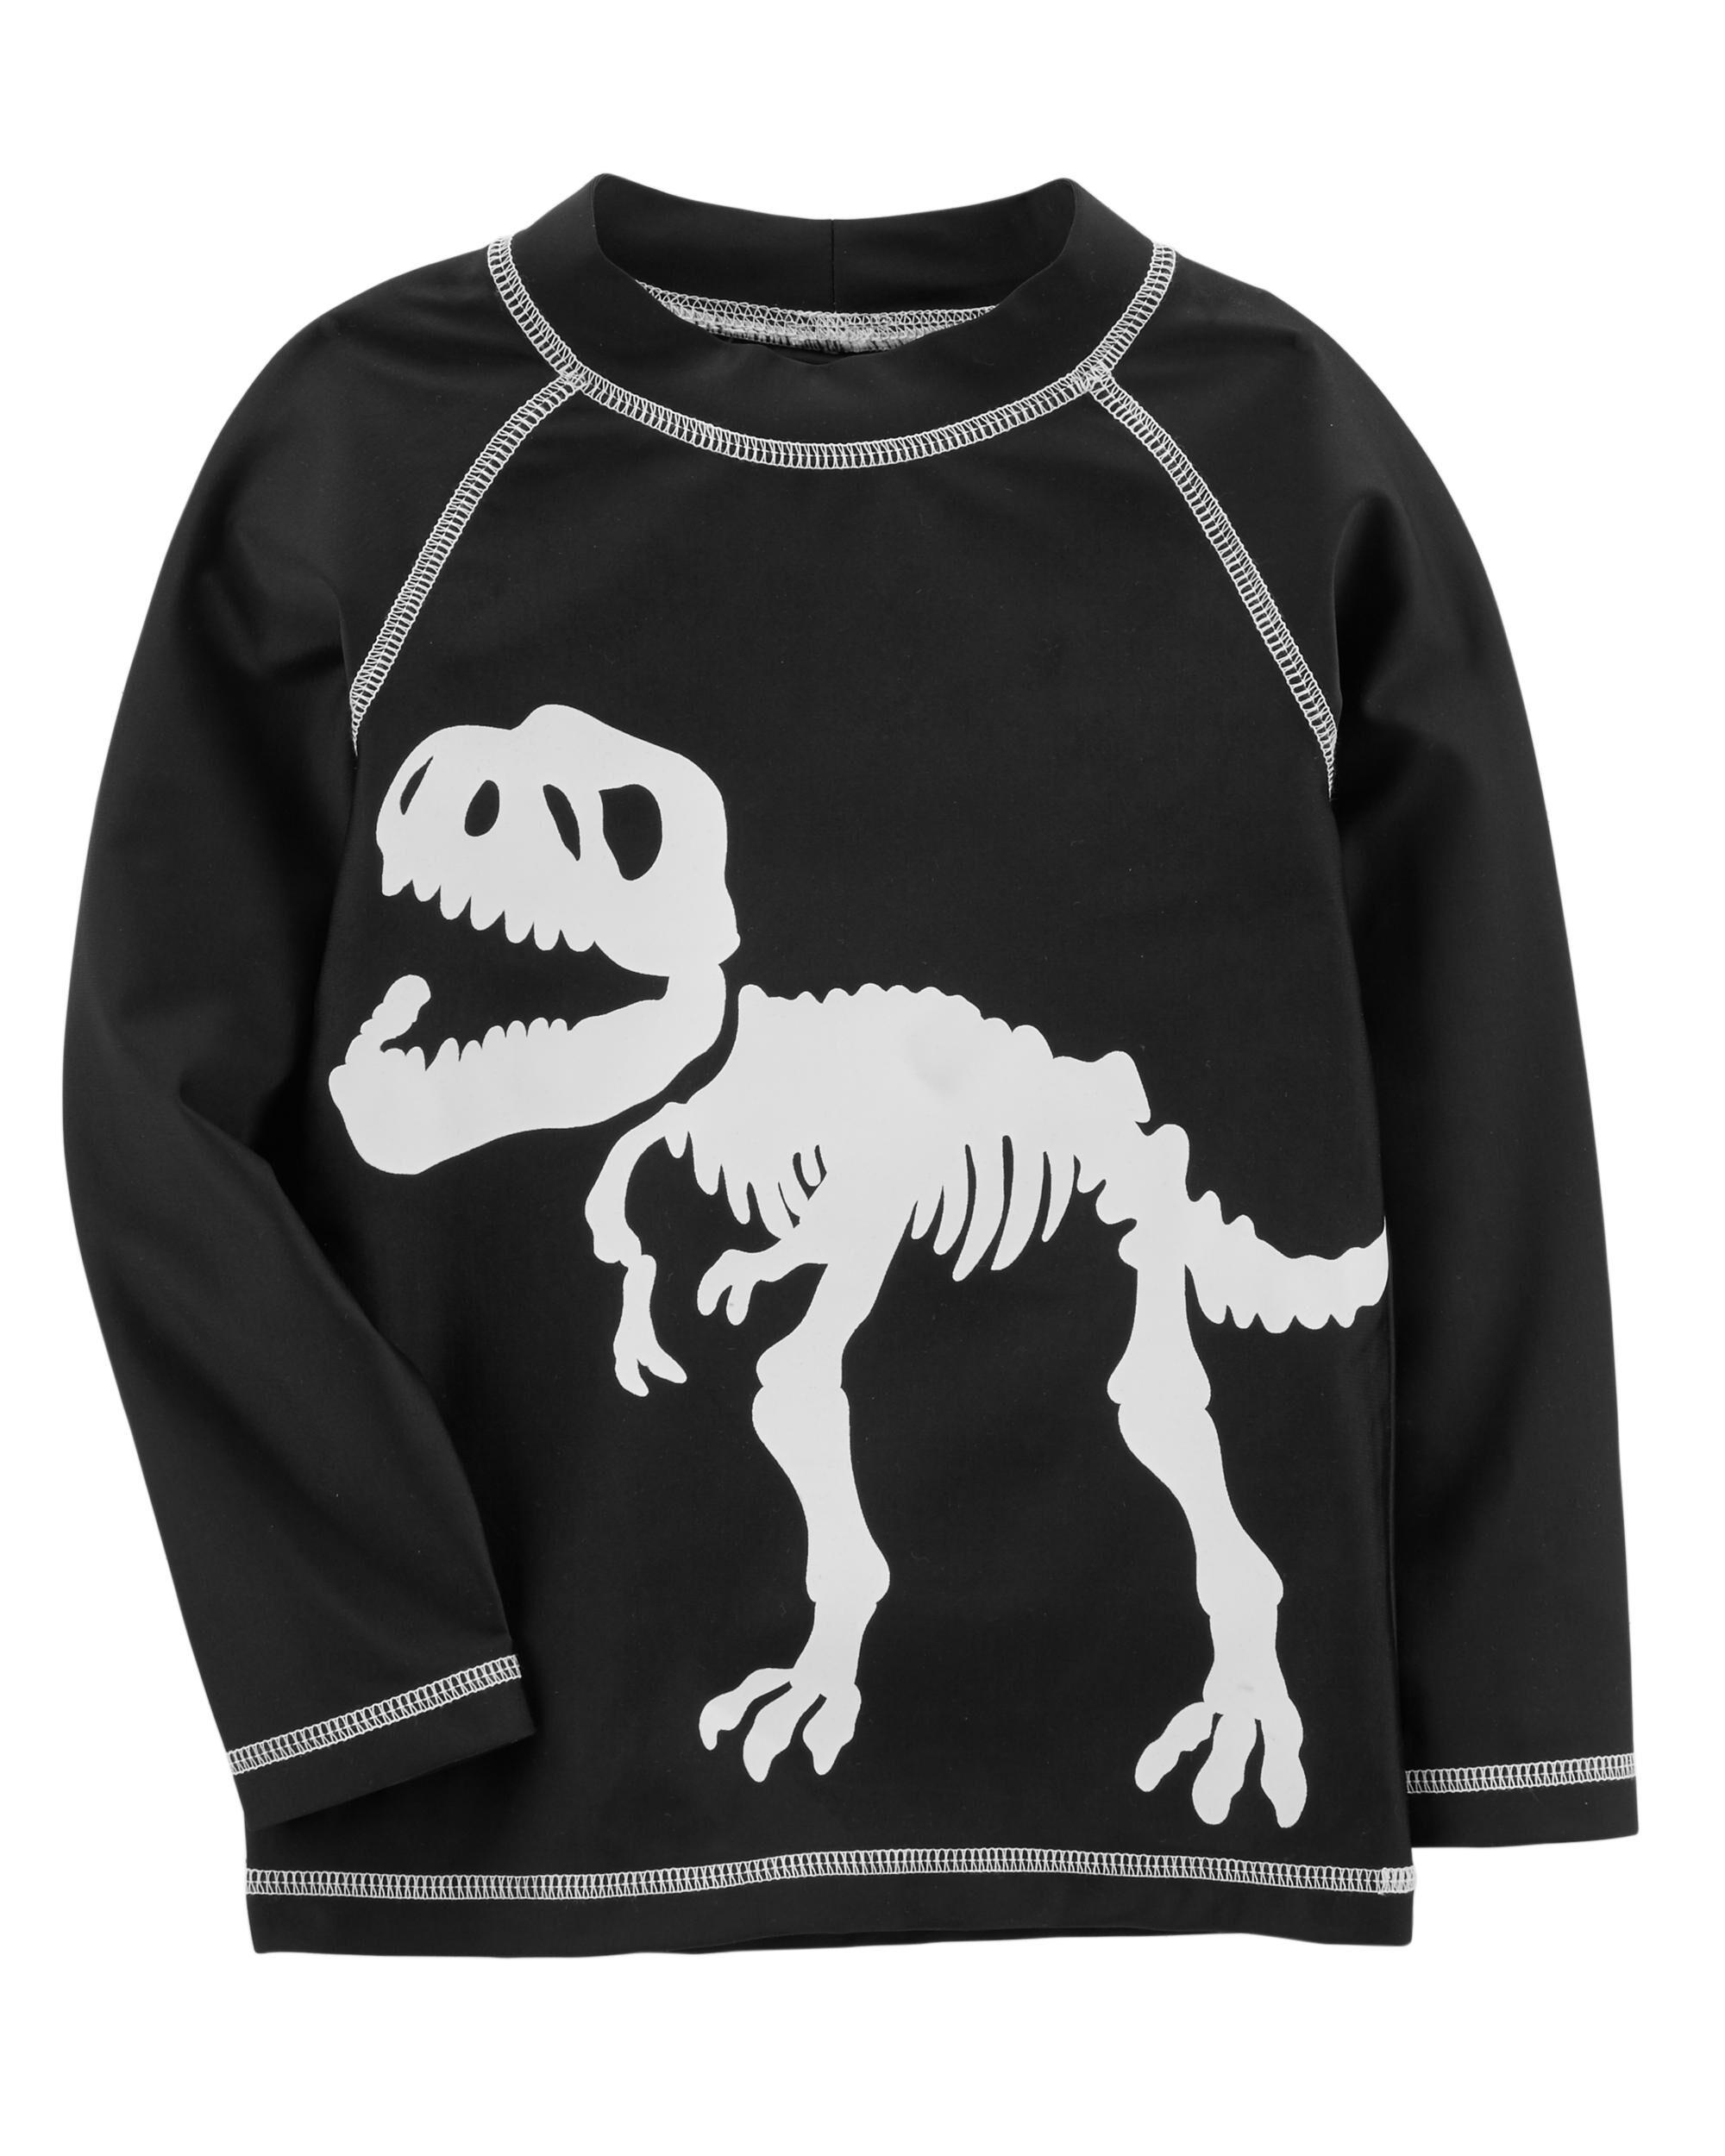 *Clearance*  Carter's Dinosaur Rashguard